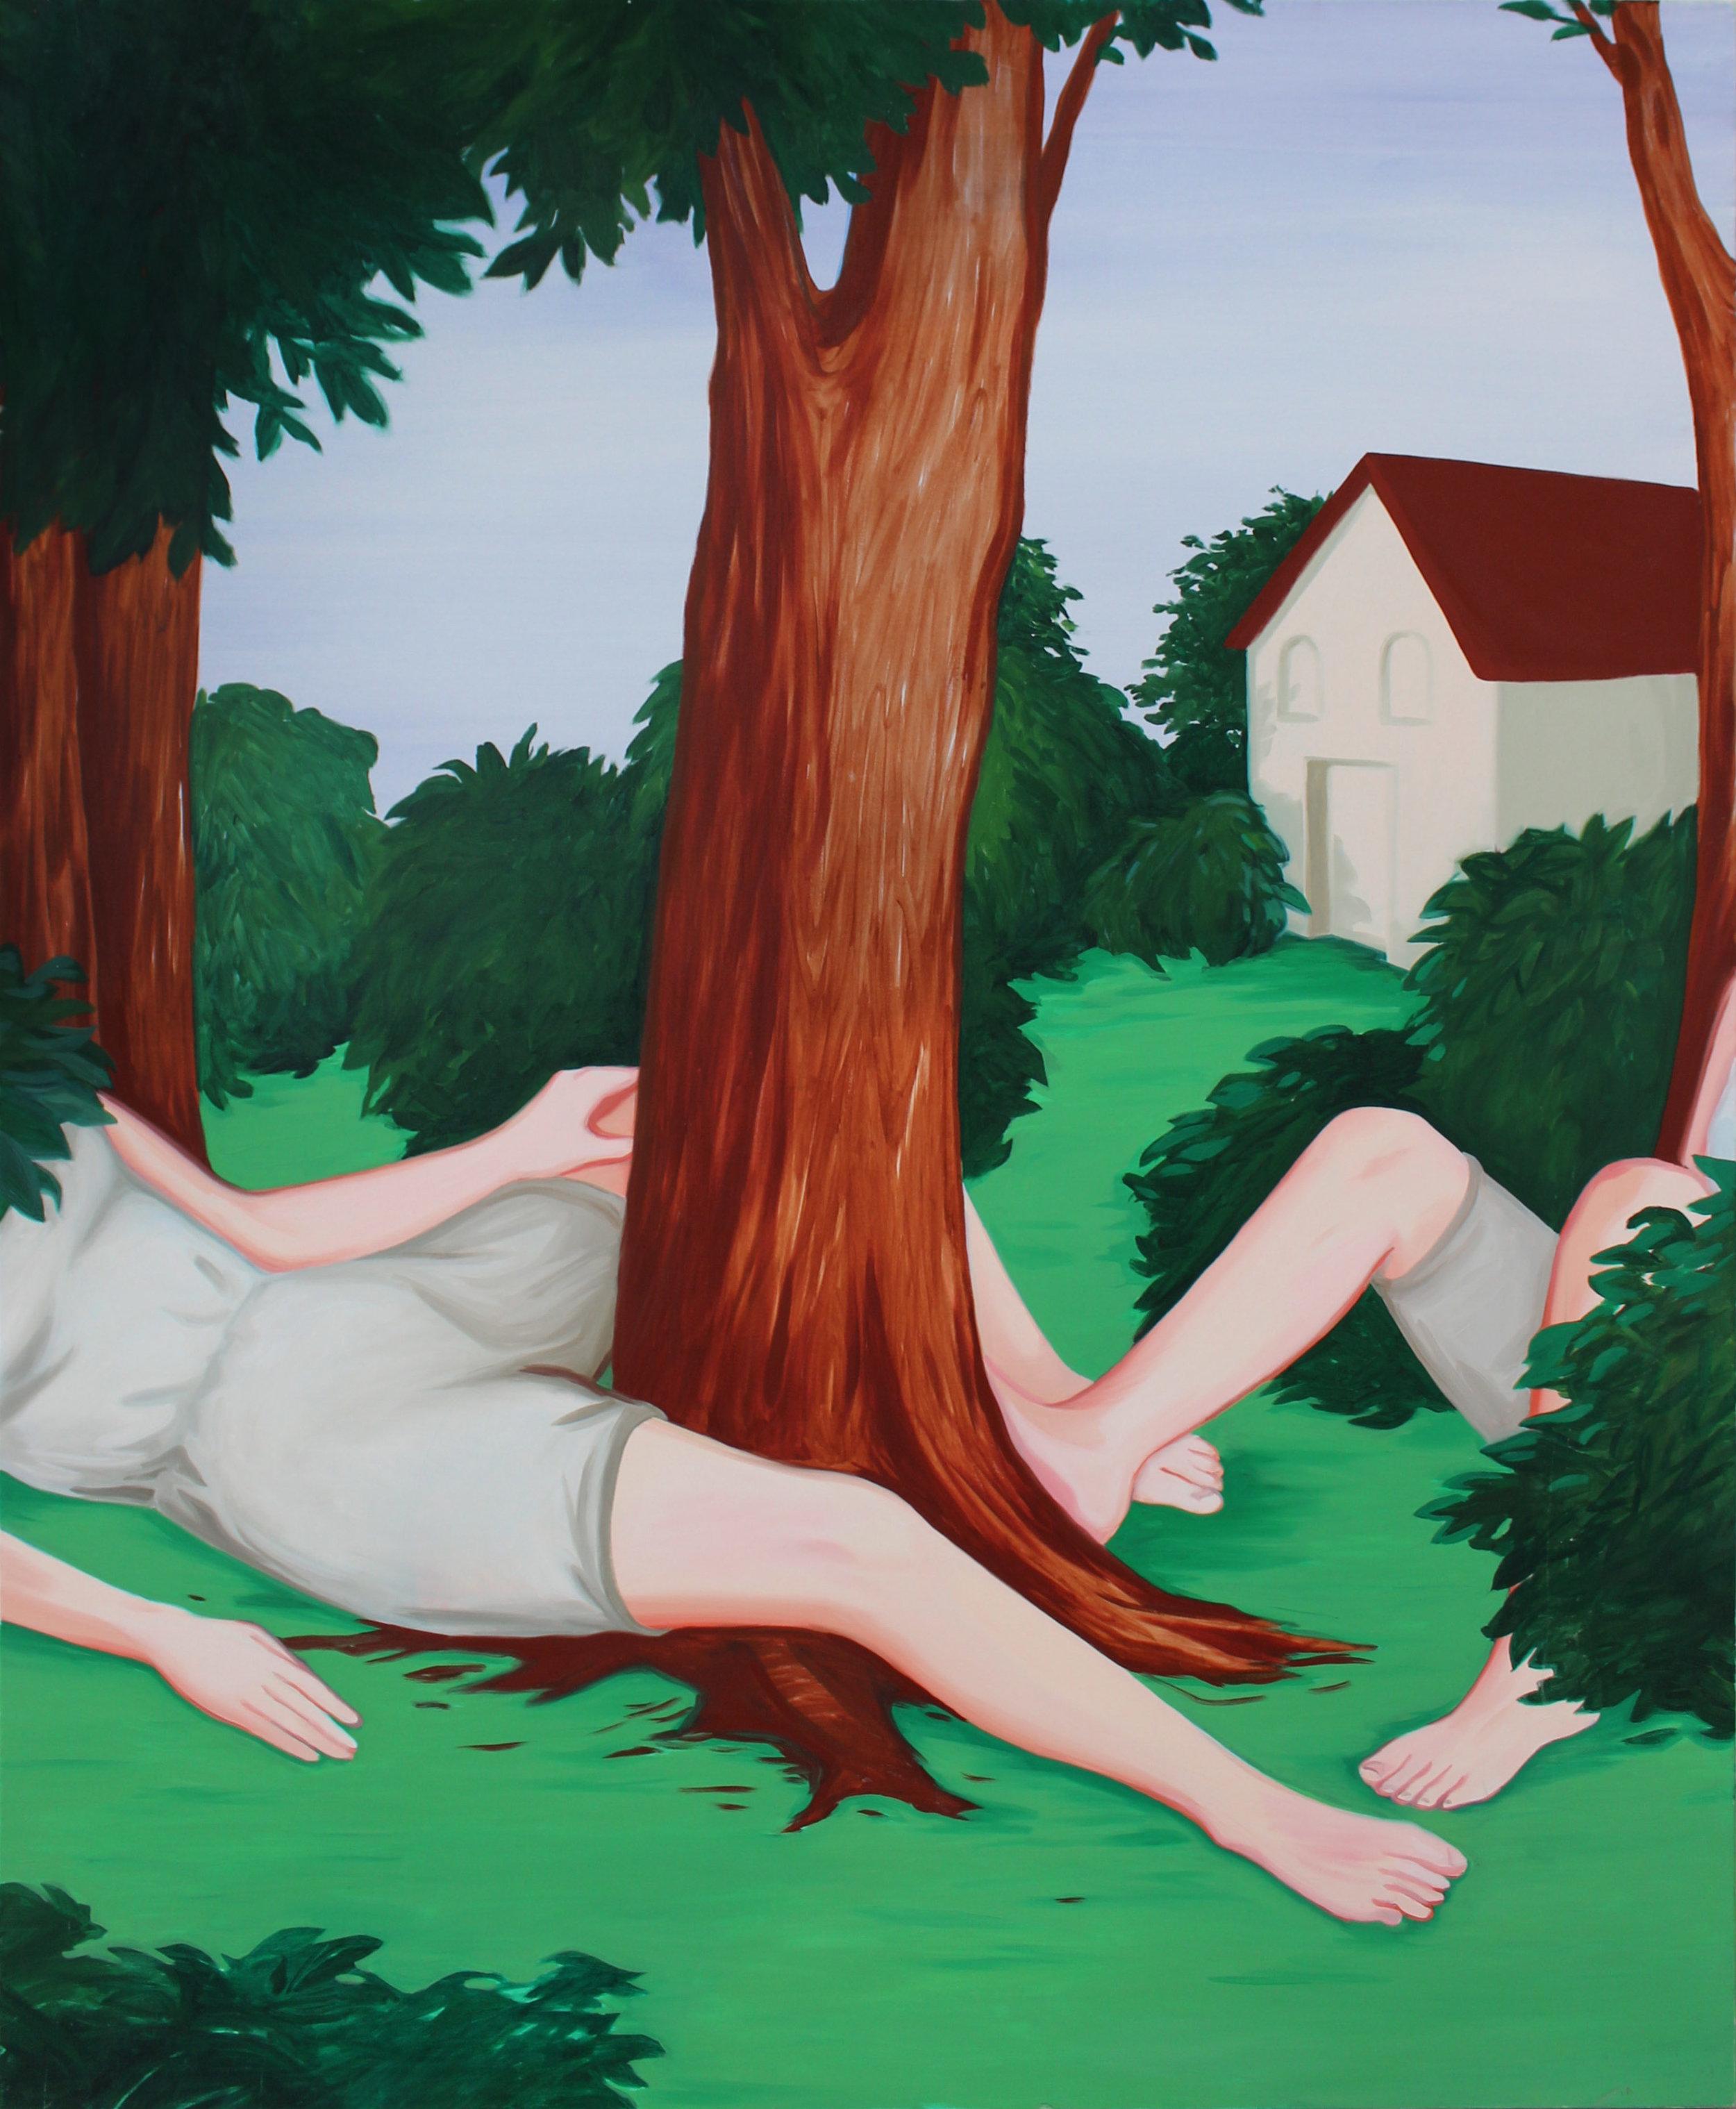 coté jardin  Oil on canvas 160 x 130 cm 2017